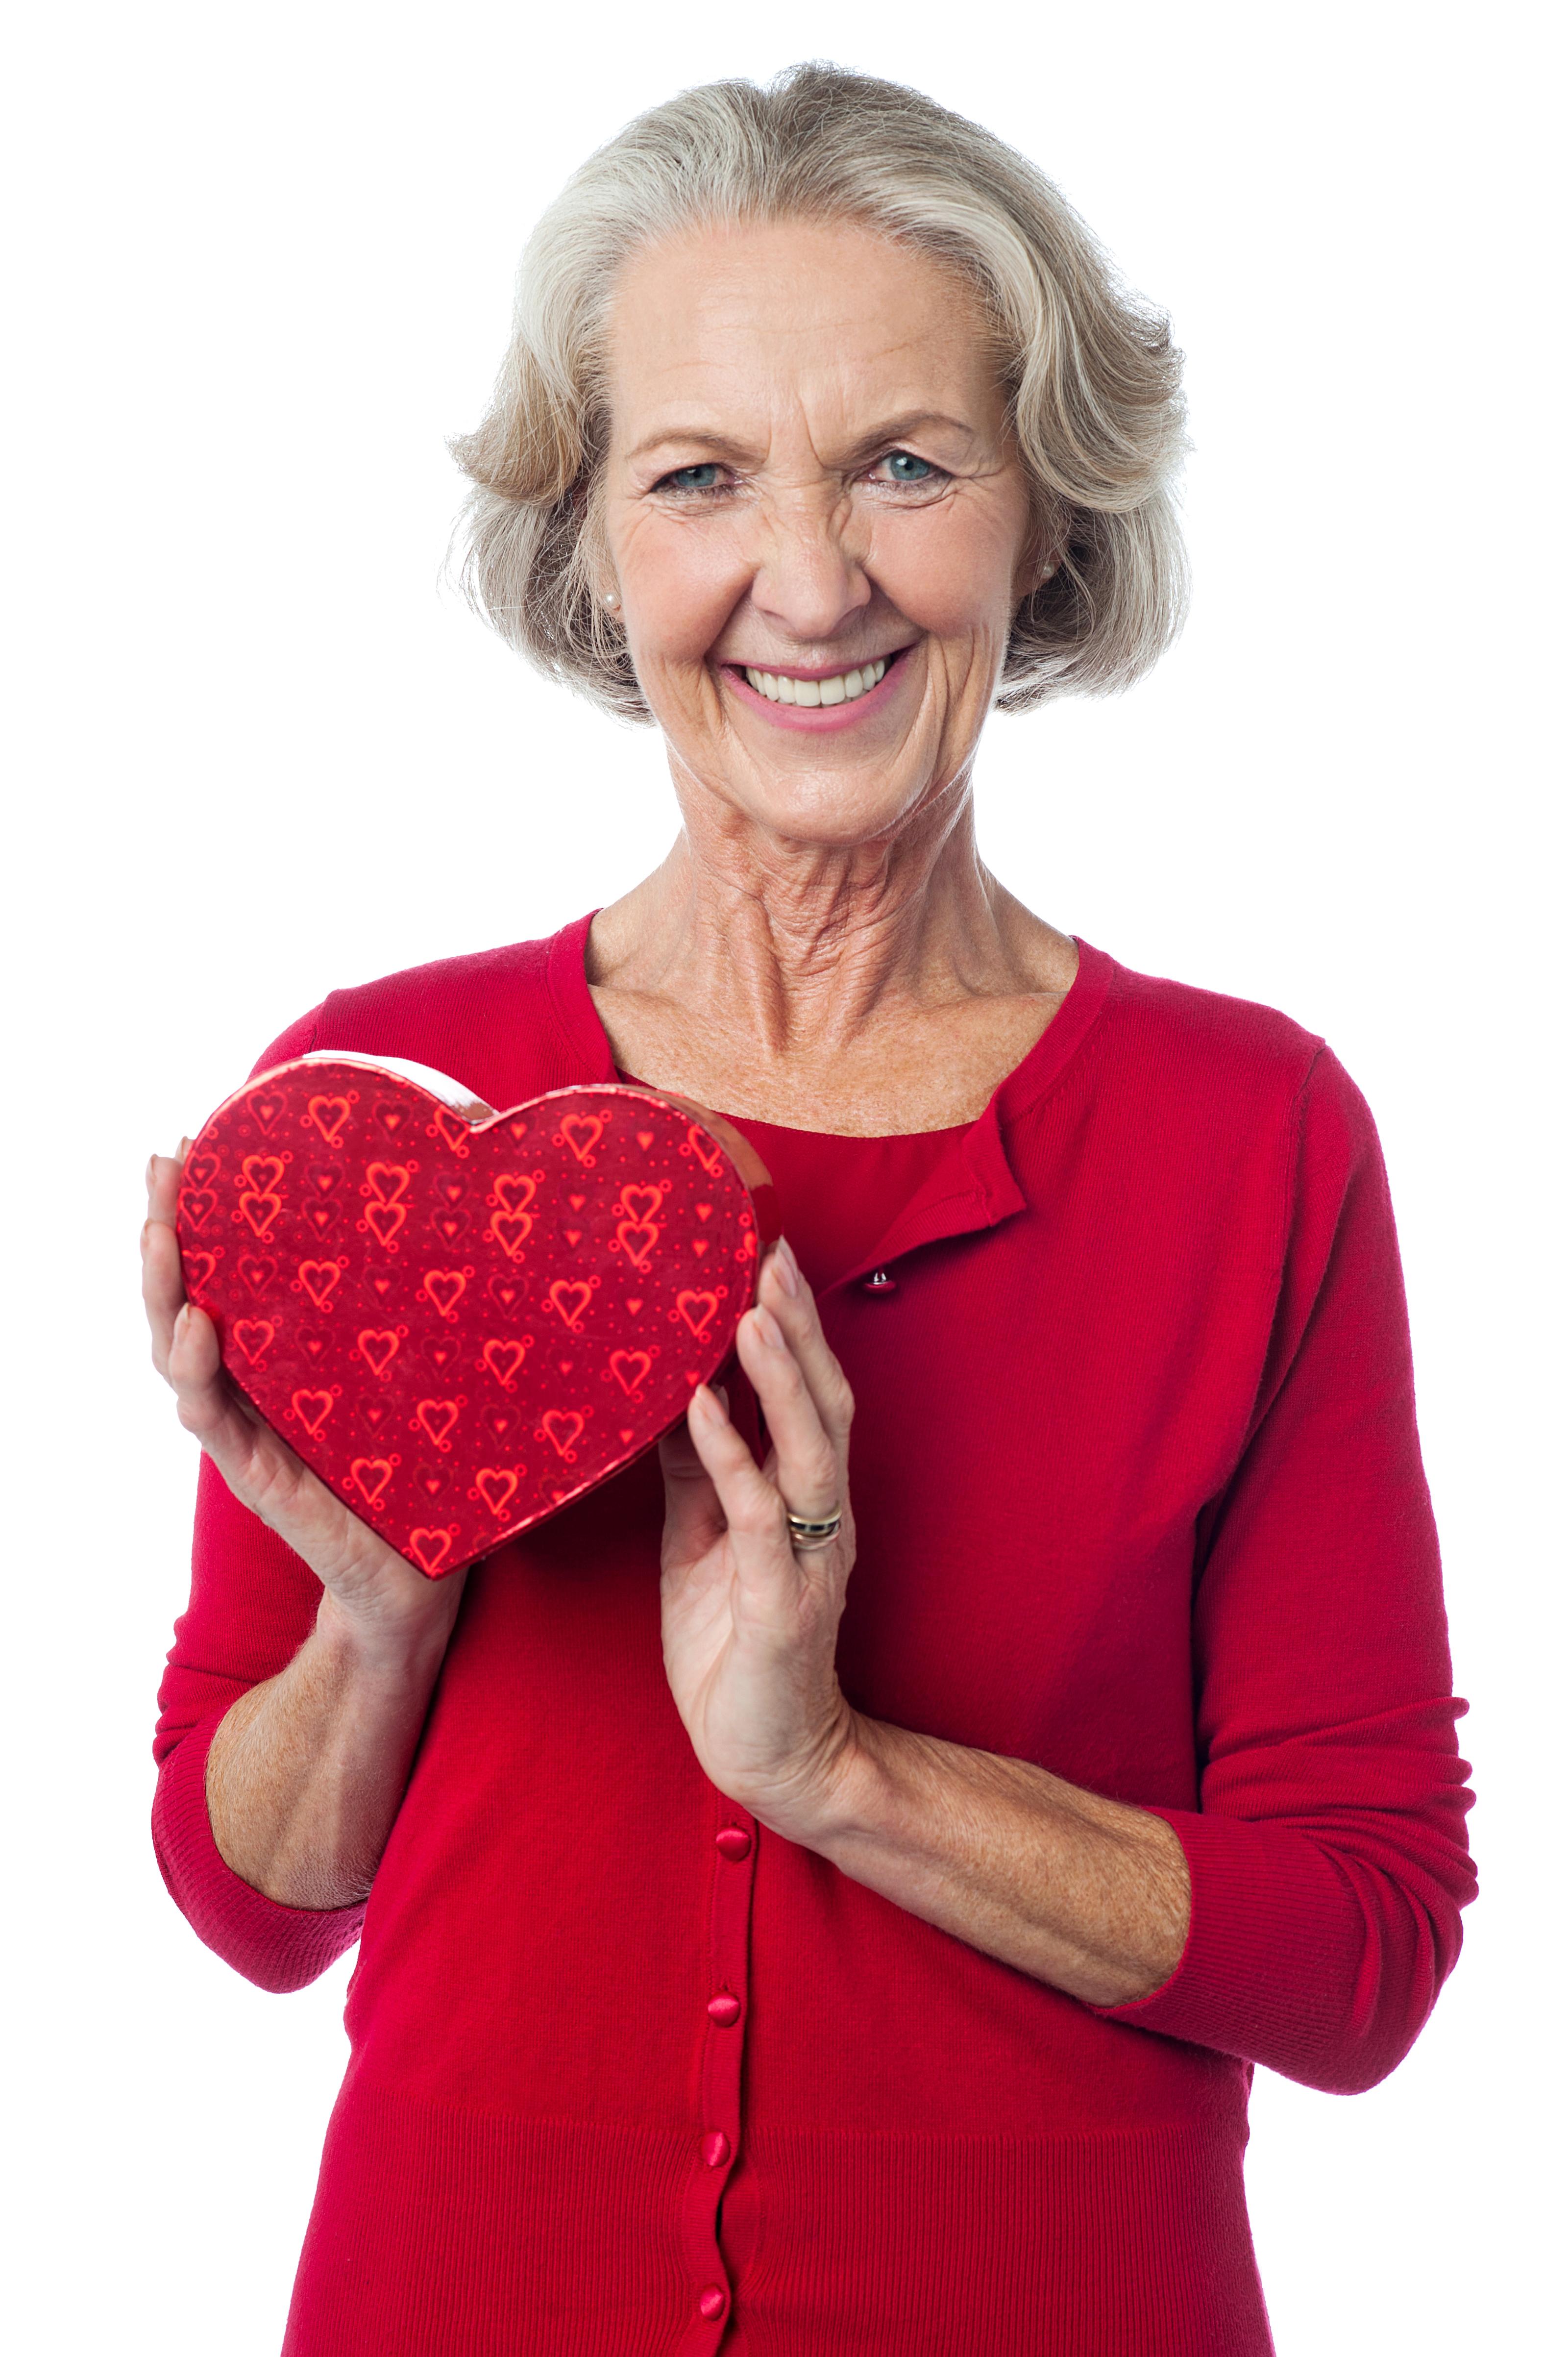 Granny PNG Image.